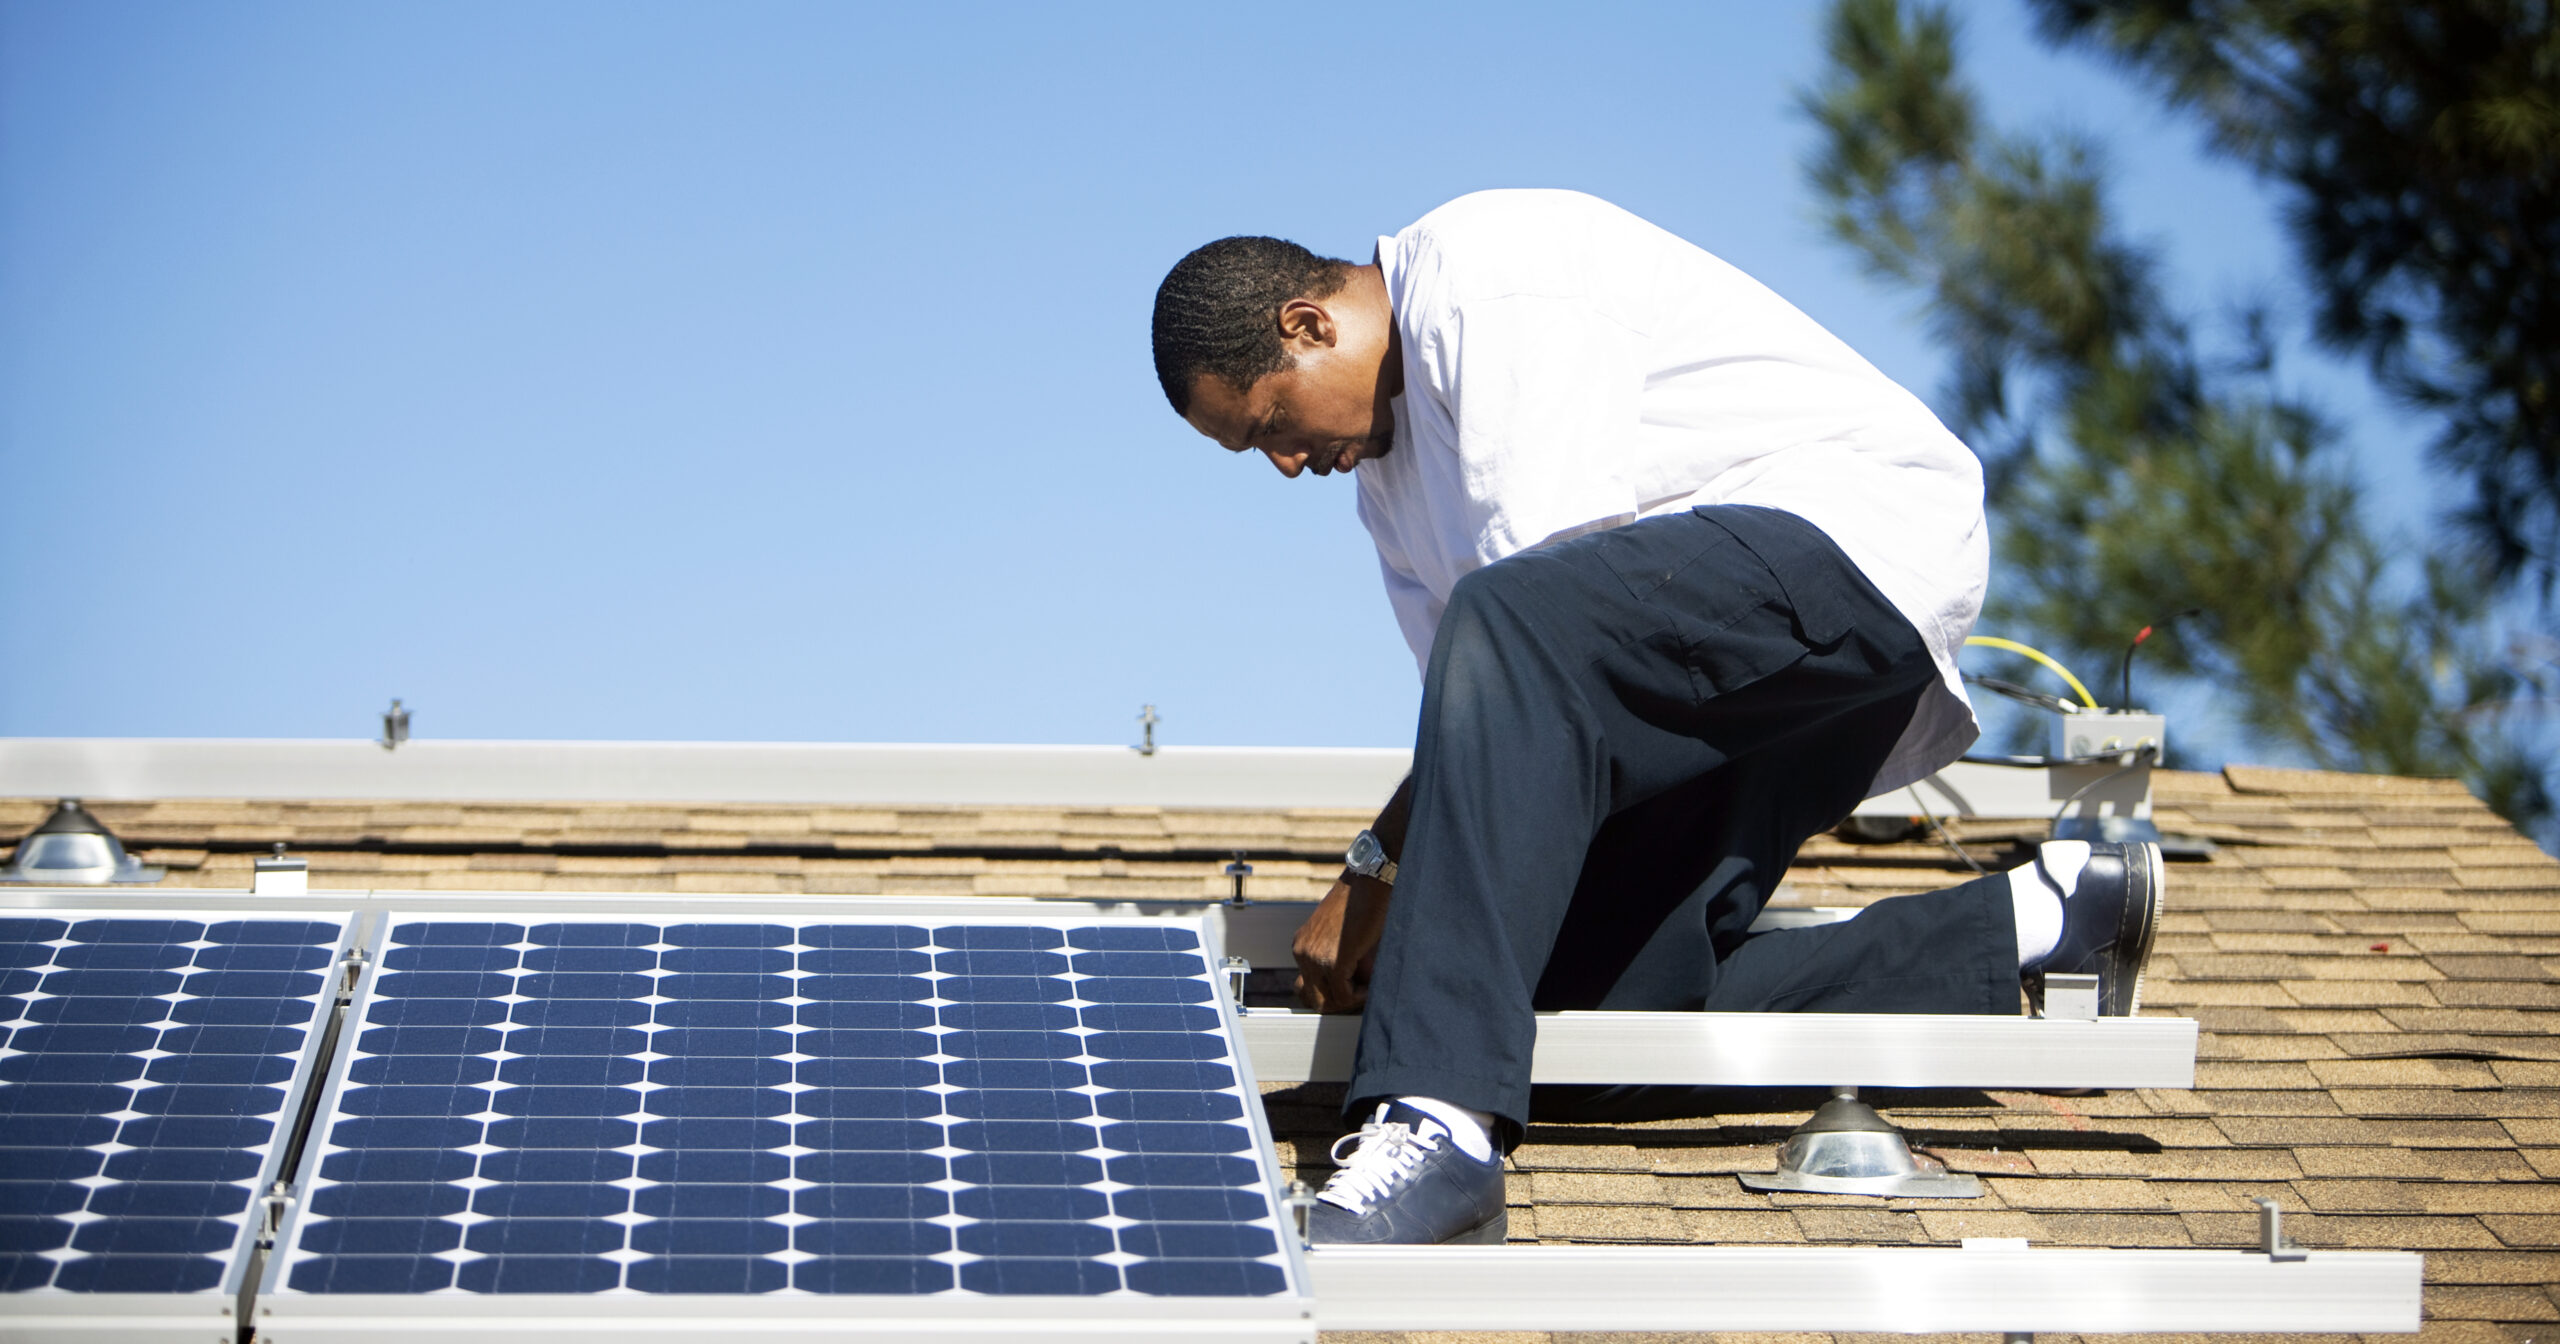 Community Solar Powers Major Economic Impacts in Local Communities